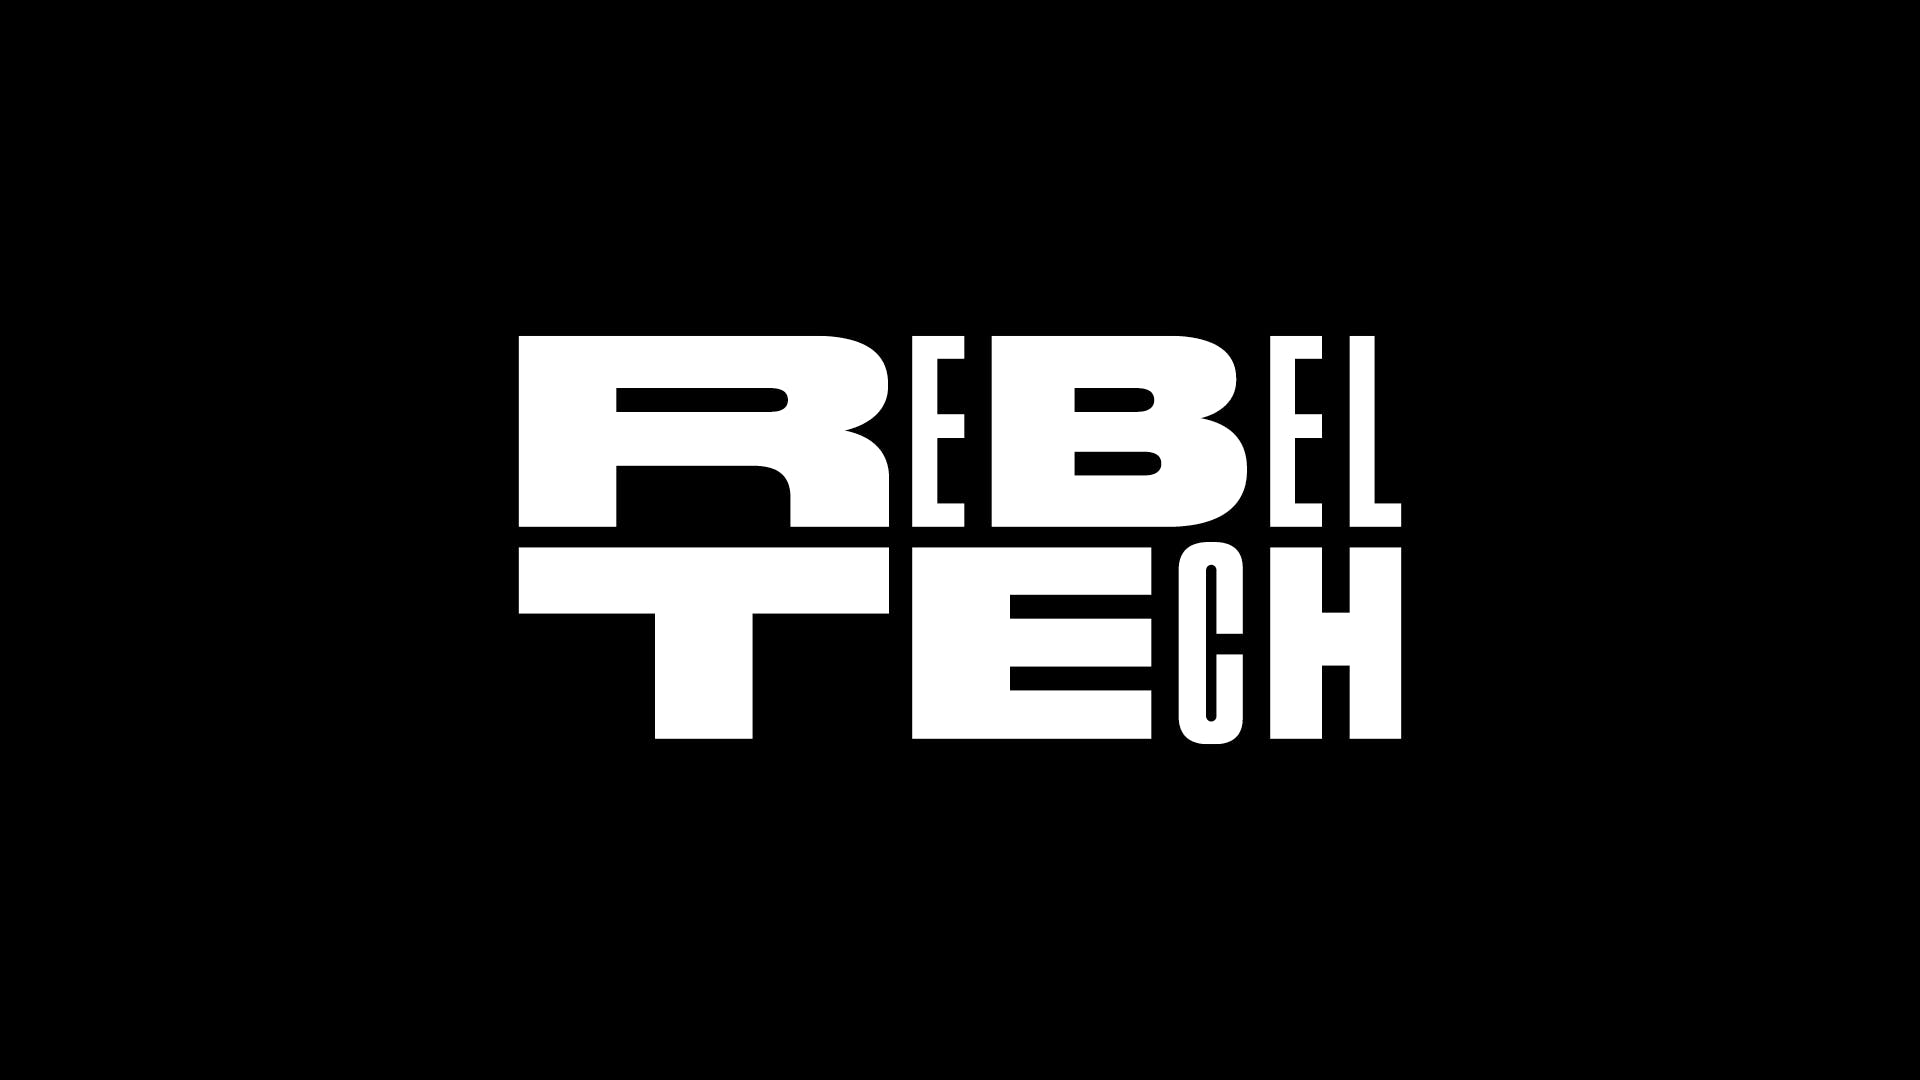 Rebeltech Logo